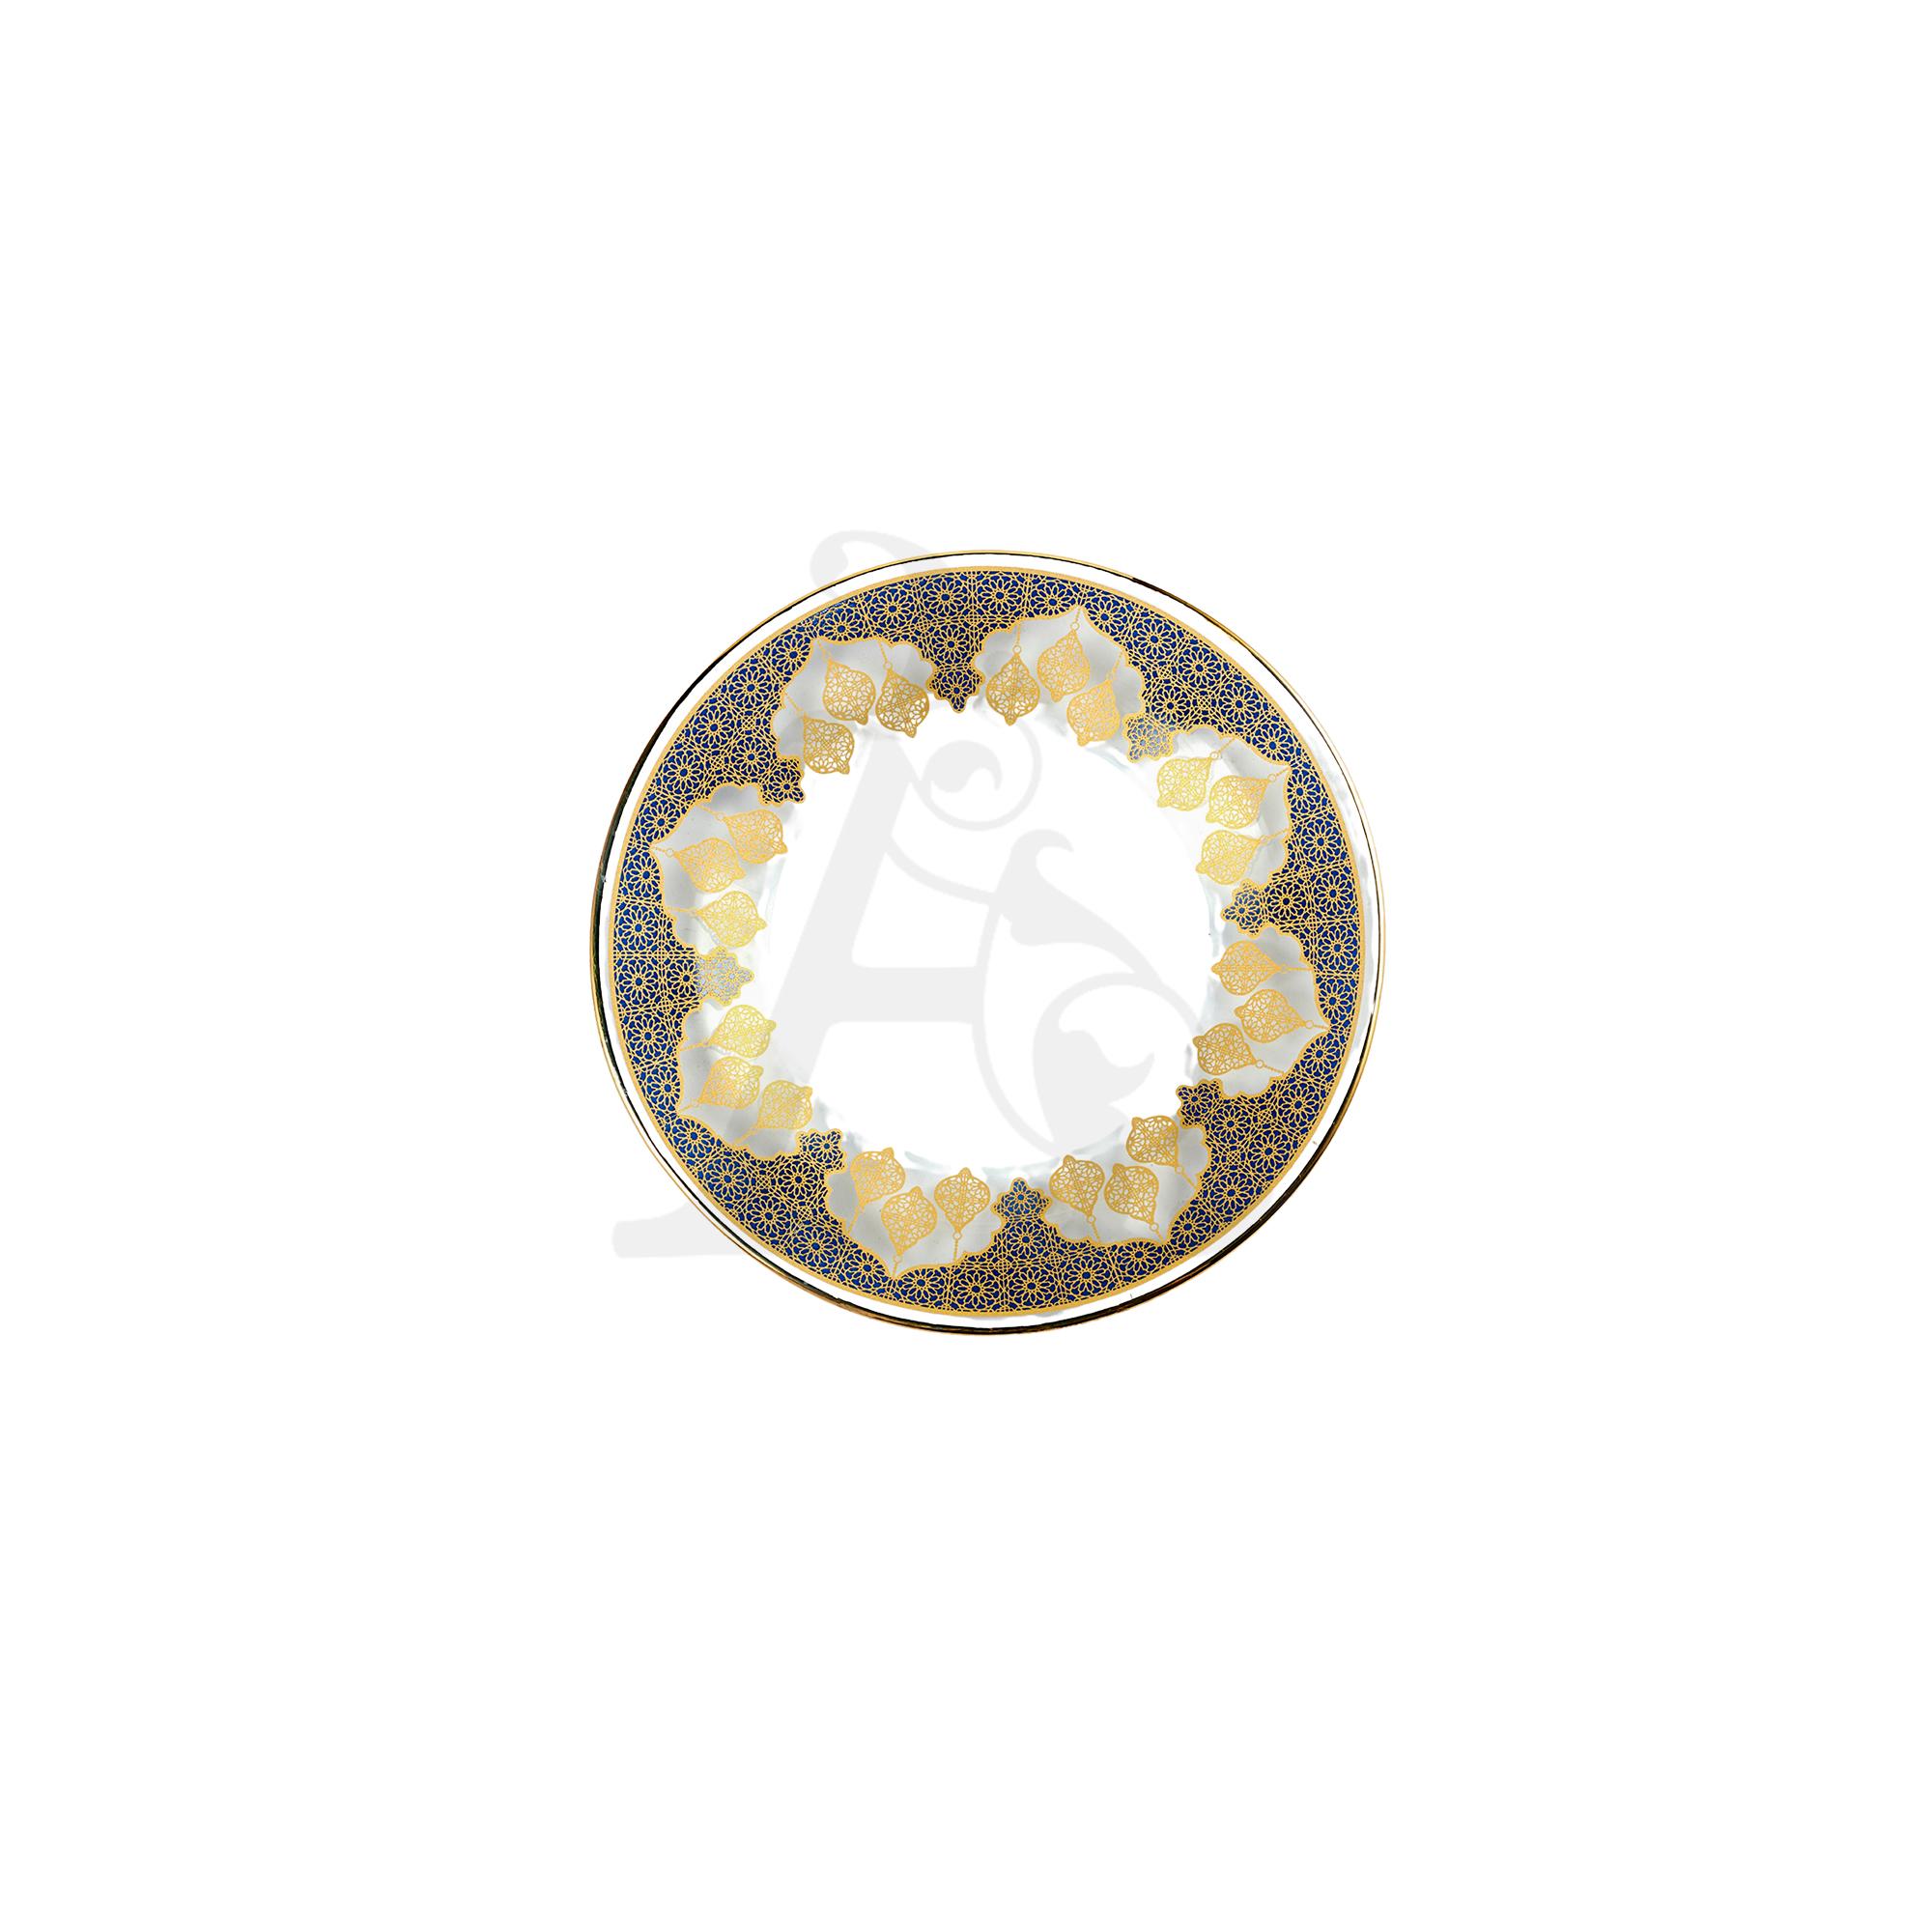 Buy Invitation Tempered Glass Single Plate 10327